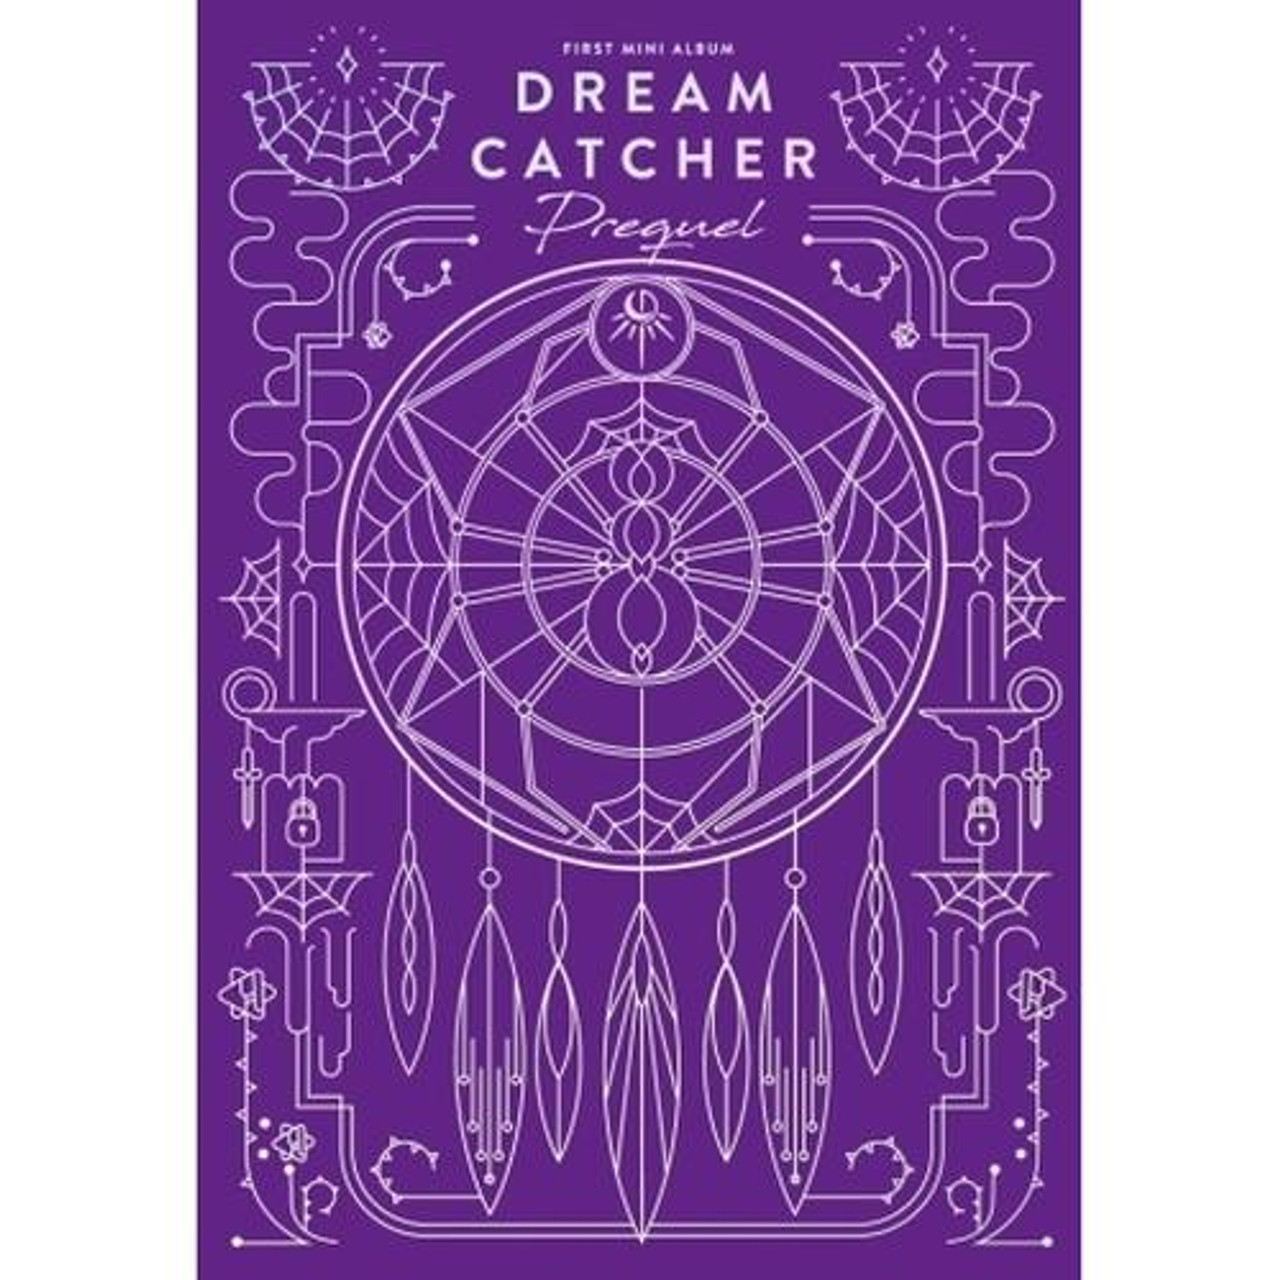 DREAM CATCHER - PREQUEL(AFTER VER.)